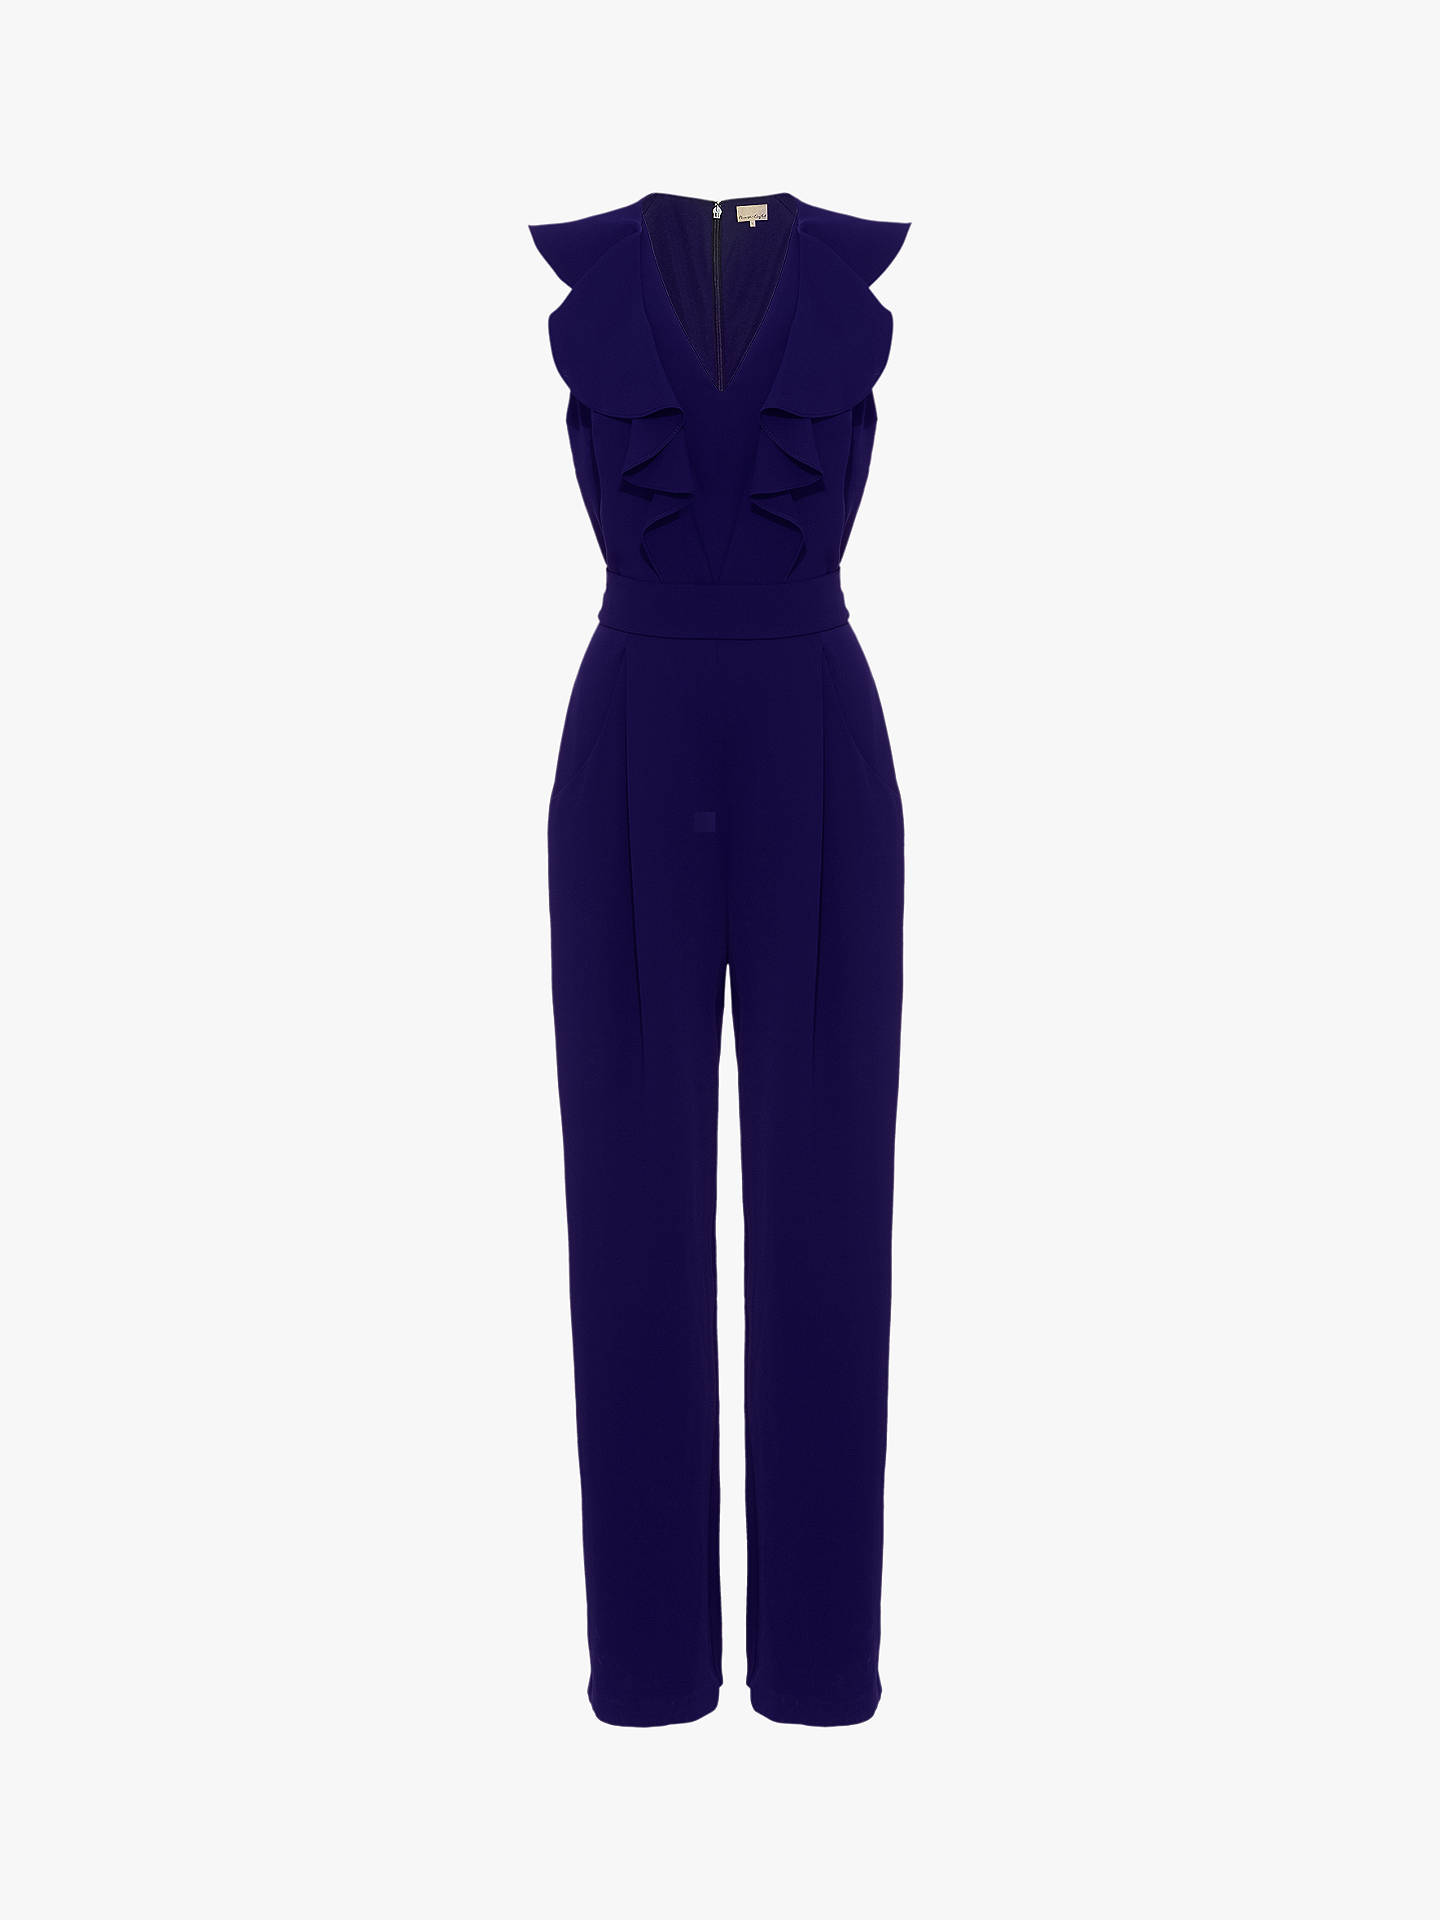 b5c05698783 Buy Phase Eight Linda Frill Jumpsuit